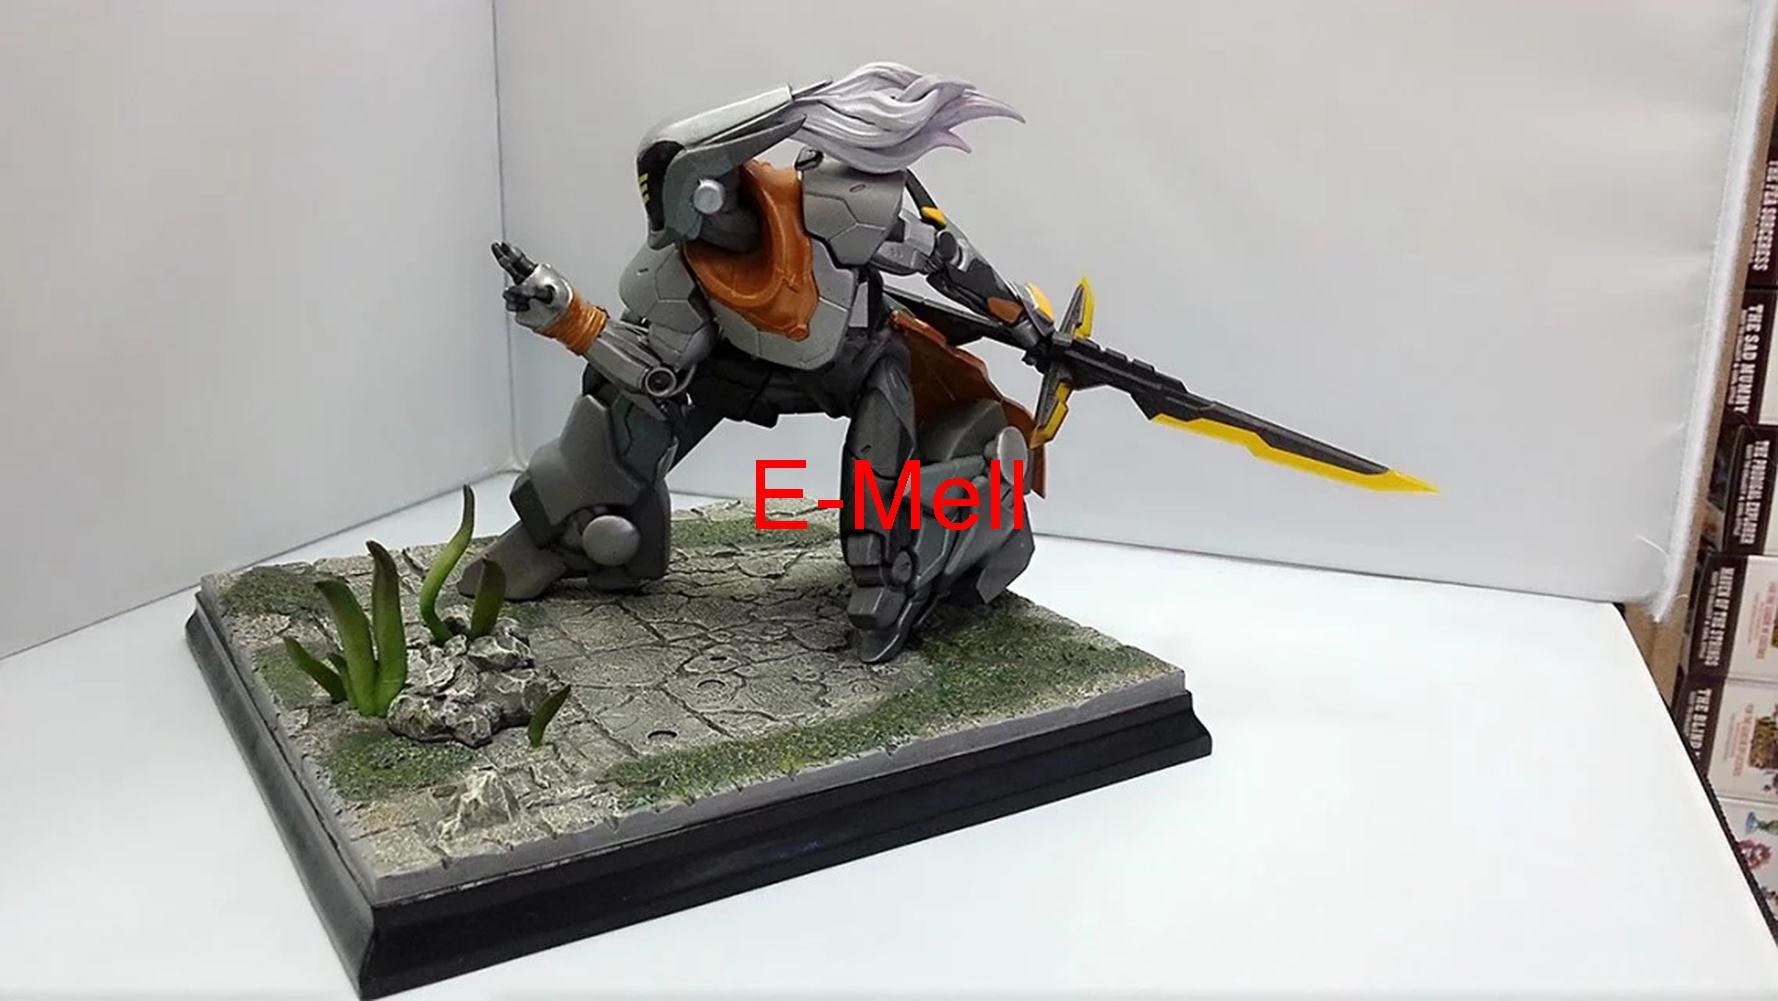 Cosplay LOL Origin Project Yi Wuju Bladesman 22cm/8.7in PVC Garage Kit Action Figures Toys GK Model<br><br>Aliexpress